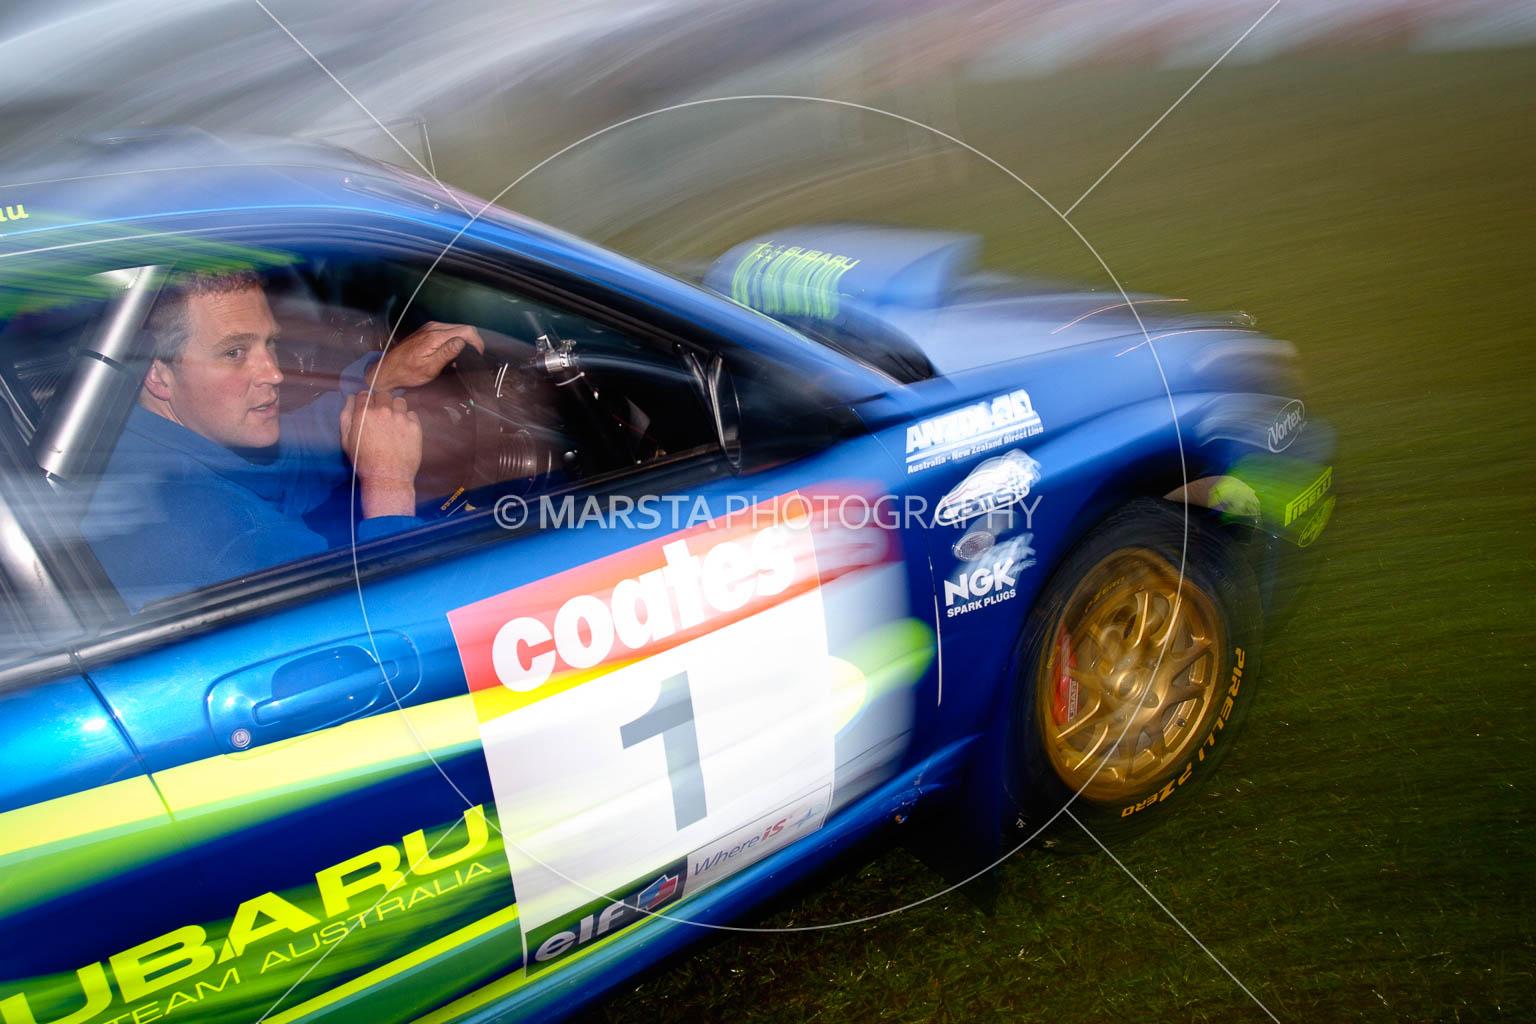 (1);4 June 2005;ARC;Australia;Australian Rally Championship;Coates Rally Queensland;Imbil;QLD;Queensland;Subaru Impreza WRX;Sunshine Coast;Topshot;auto;morning;motion blur;motorsport;movement;racing;service park;wide angle